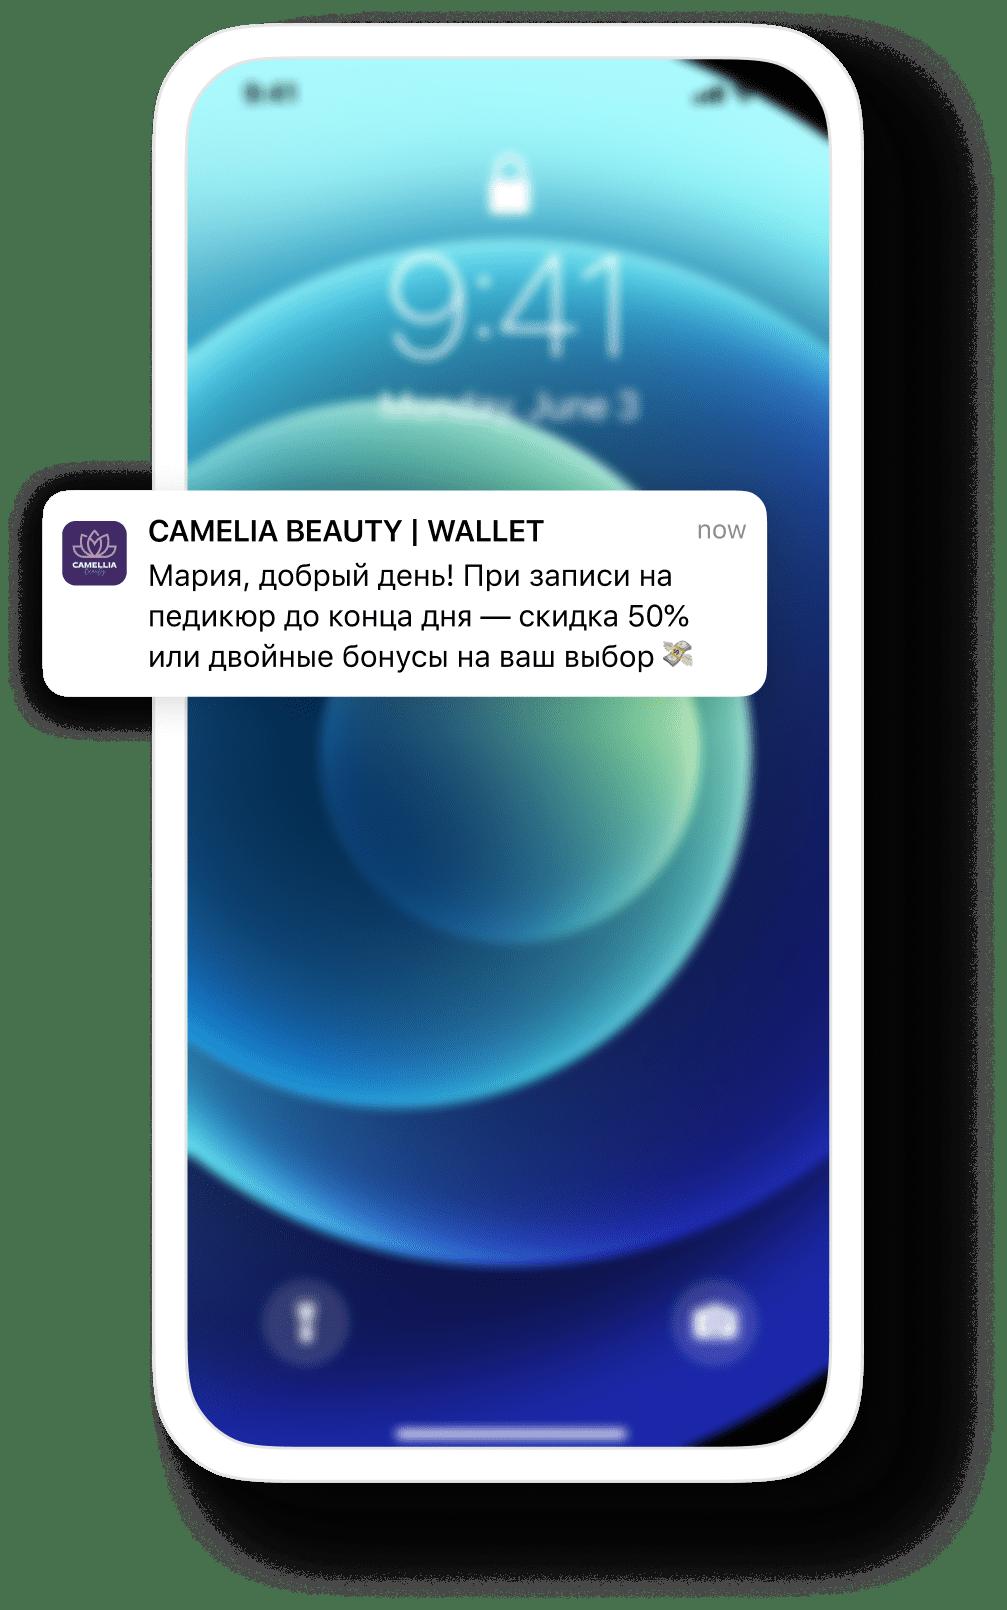 Пуш уведомления apple wallet